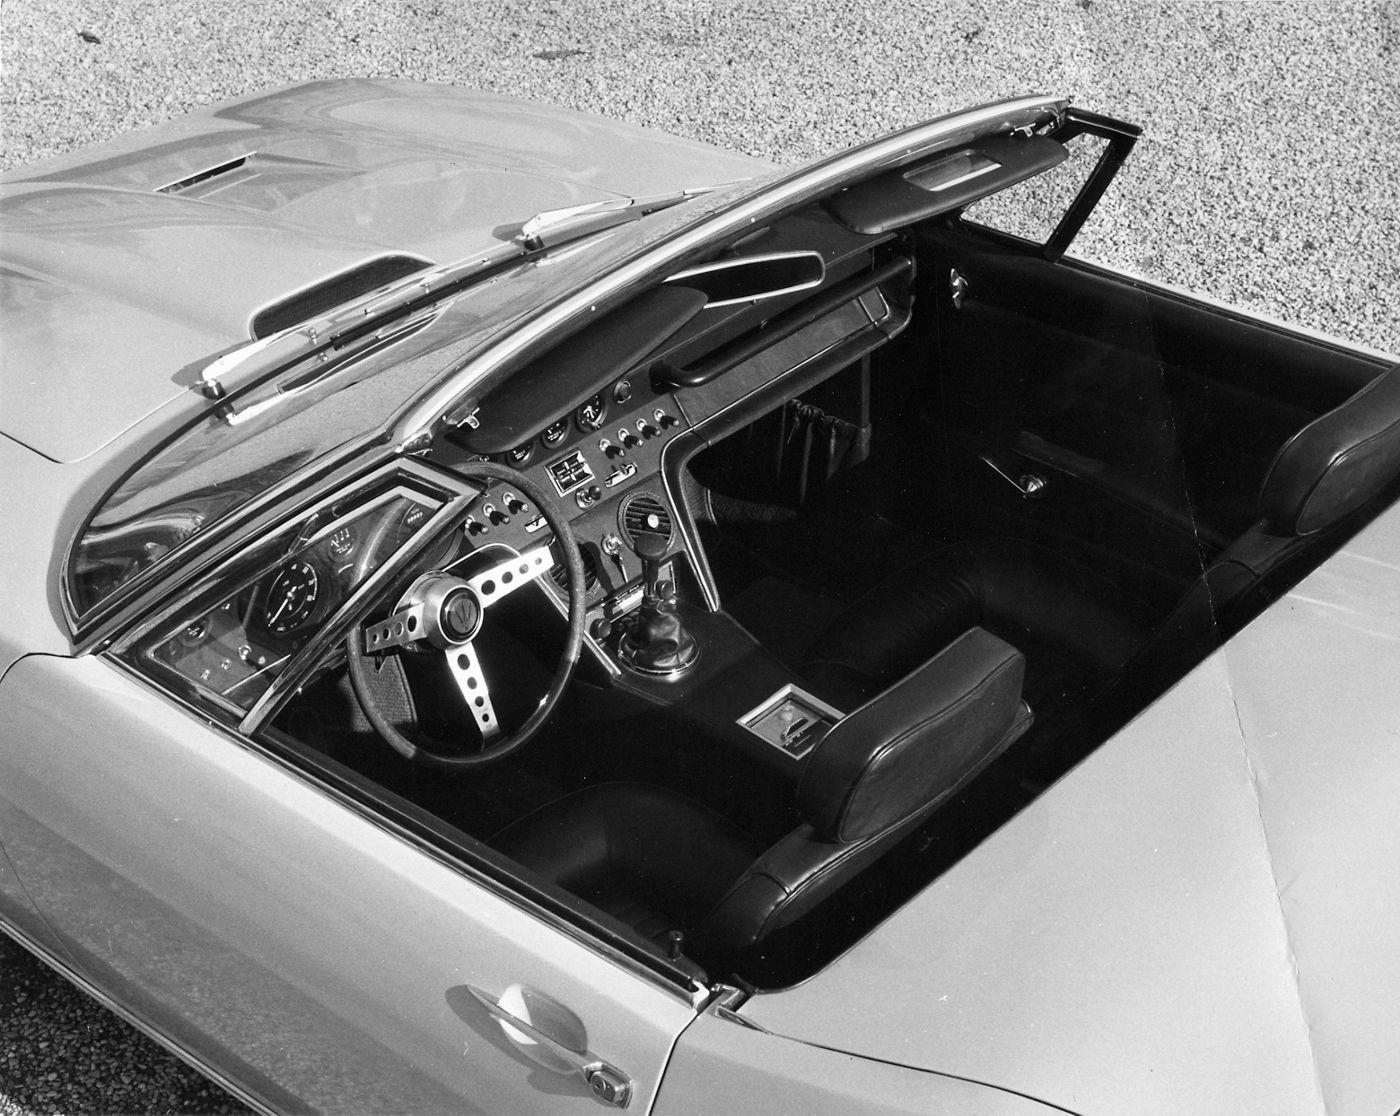 Maserati Classic - GranTurismo Ghibli - vue latérale supérieure